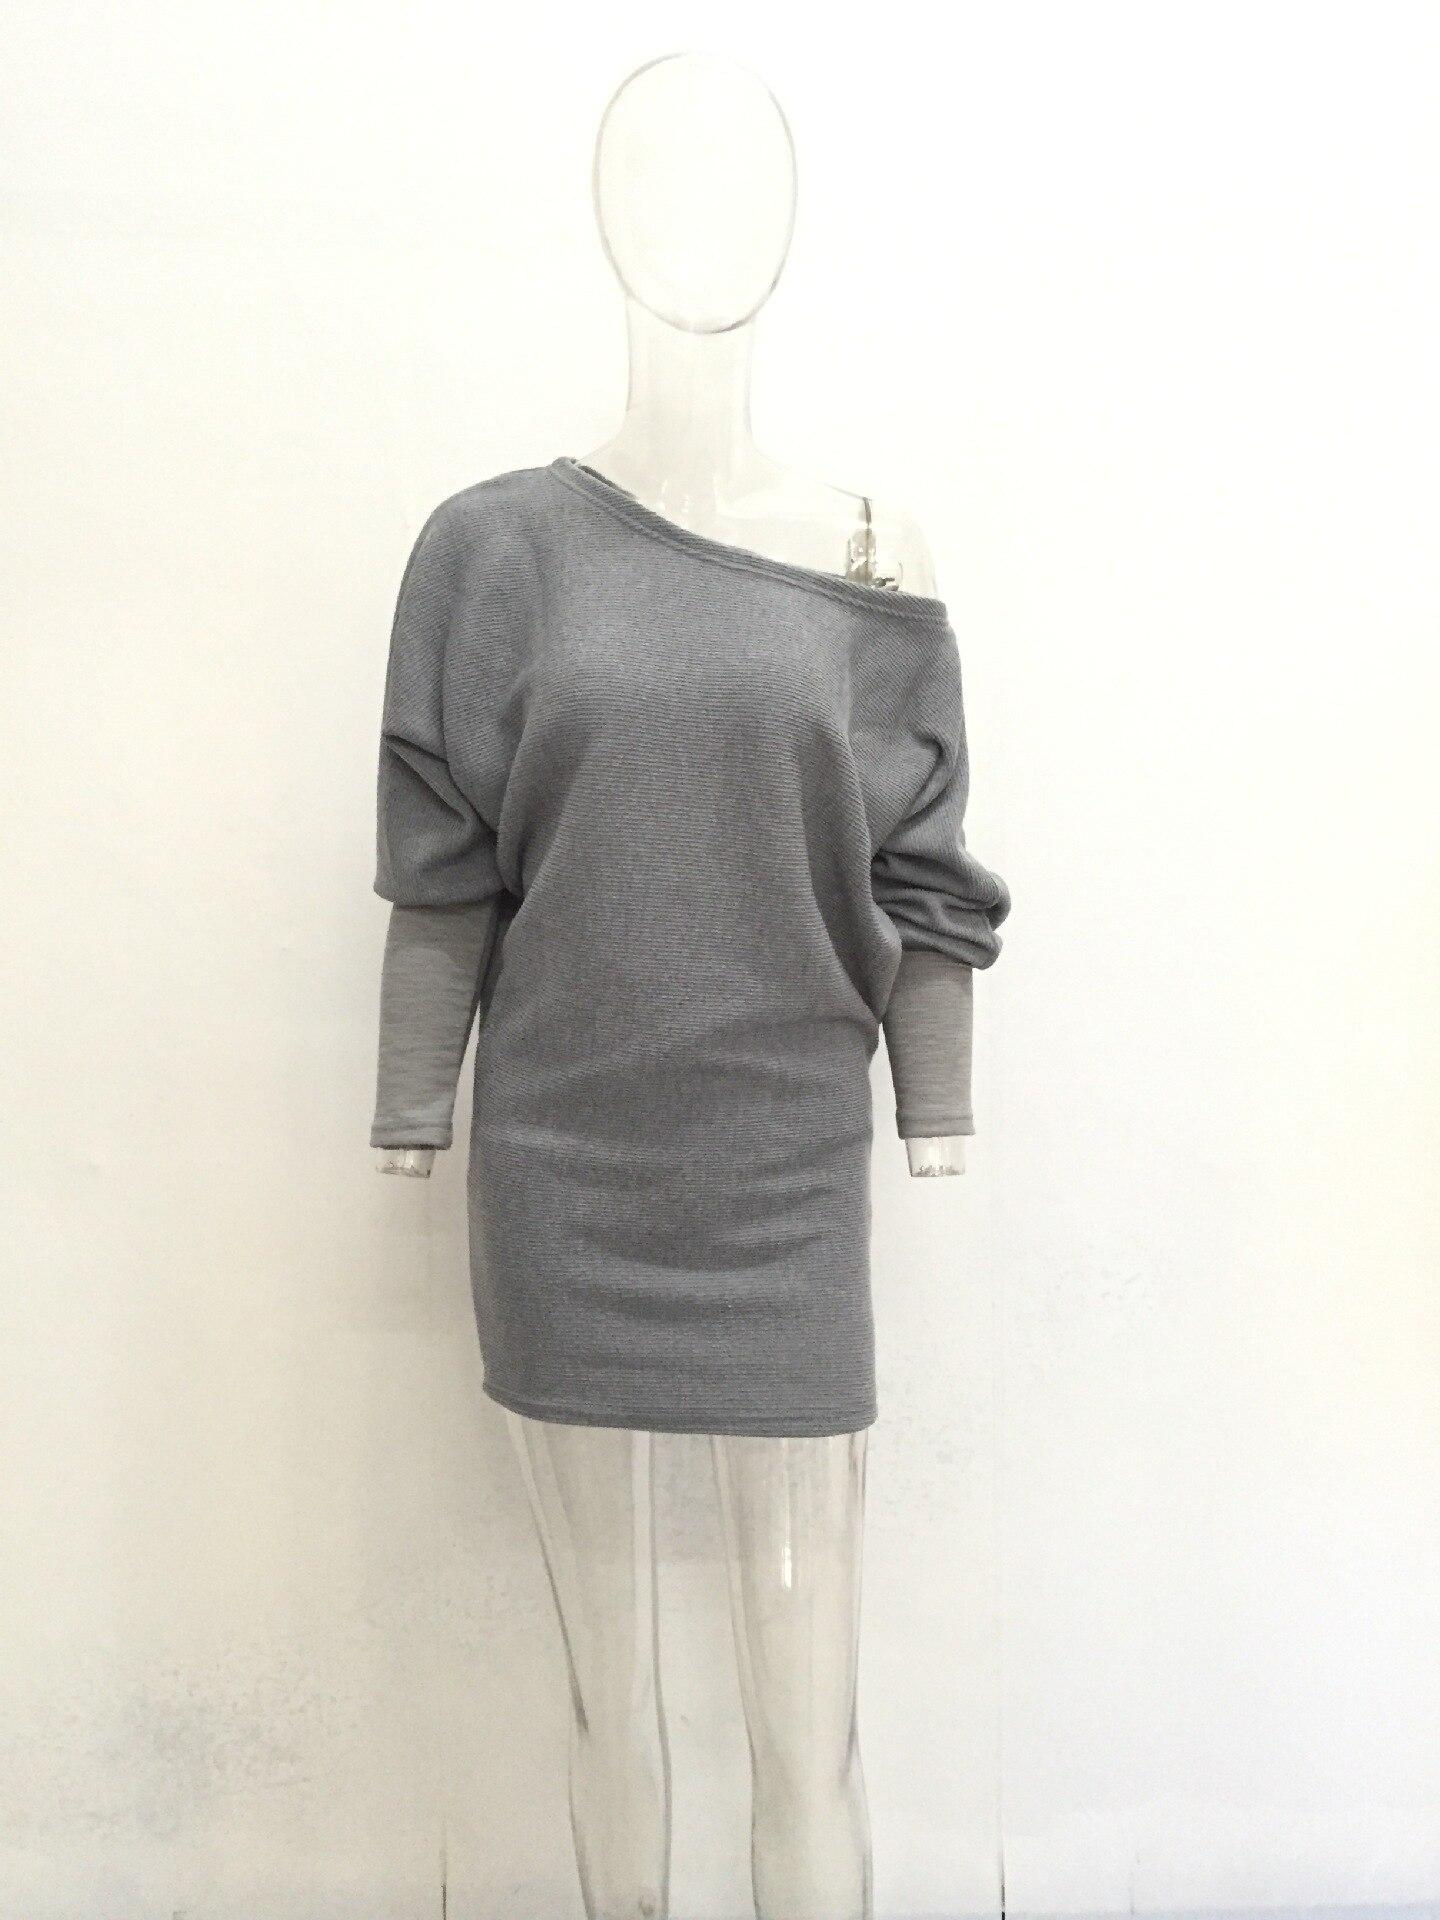 7c41482c67 Autumn Sweater Dress Bandage Velvet Dresses Bat Sleeve Bodycon Dress Plus  Size Women Clothing Online Shopping India Winter Dress-in Dresses from  Women's ...